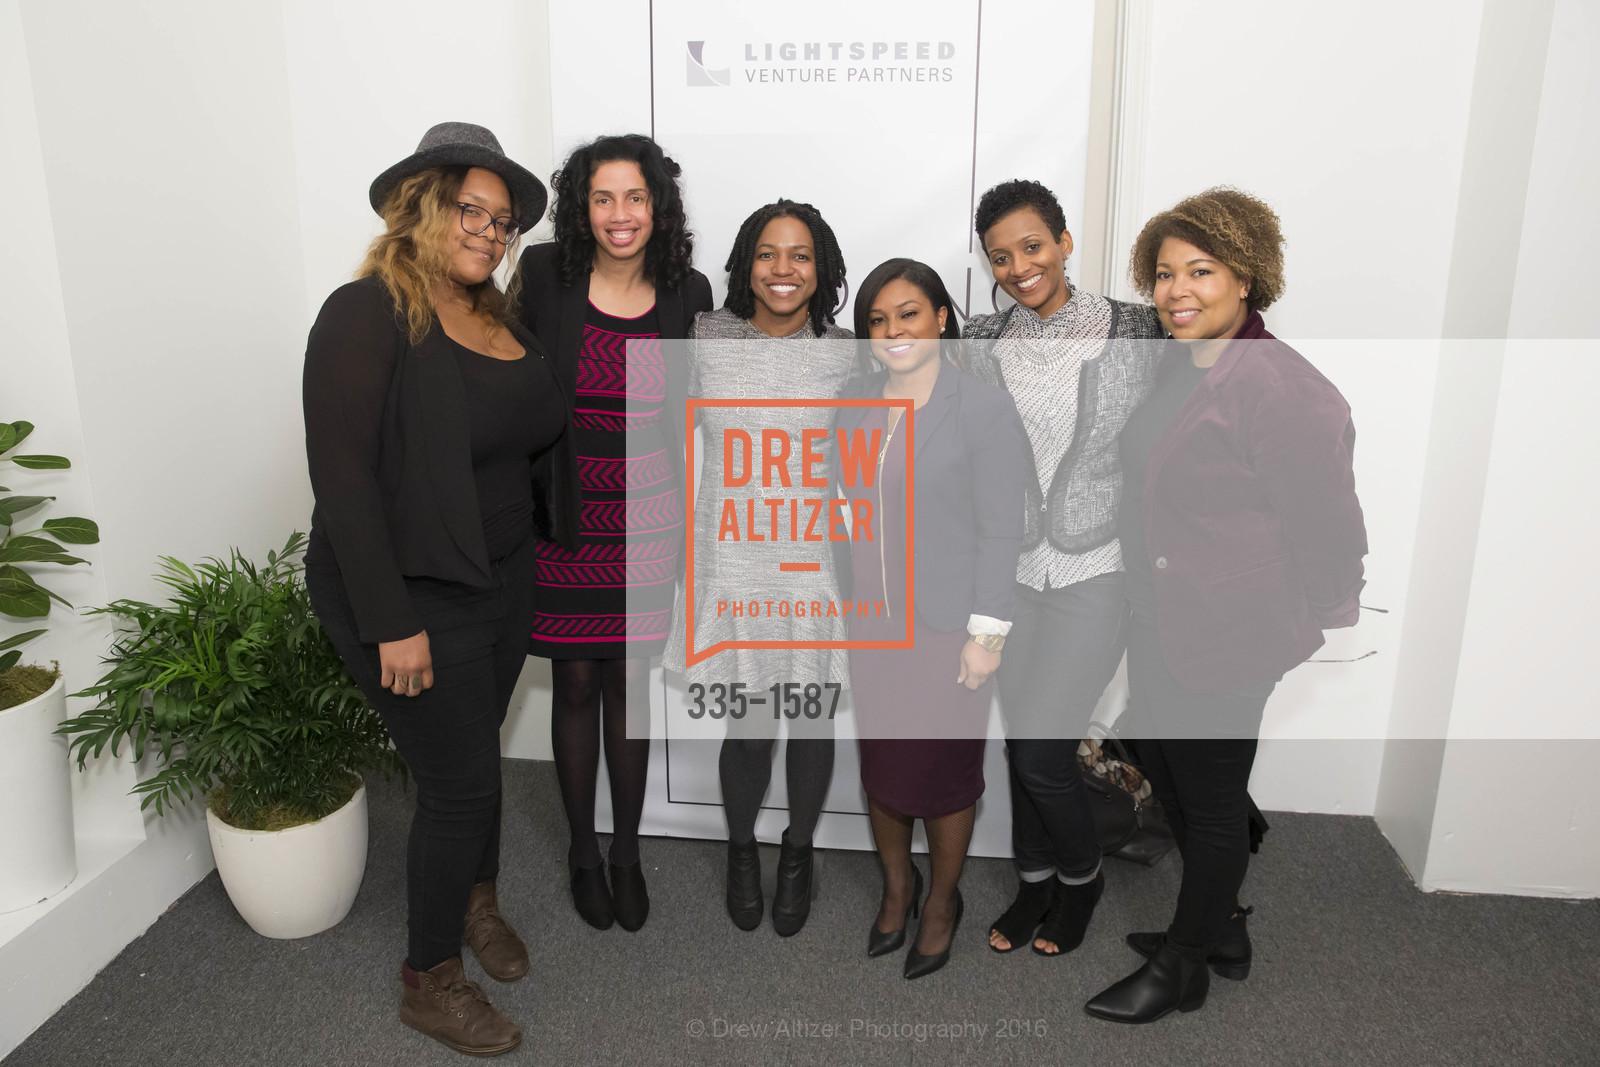 Laura Kirby, Aquaria Harley, Stacy Brown-Philpot, Minda Hart, Michelle Godfrey, Stephanie Williams, Photo #335-1587